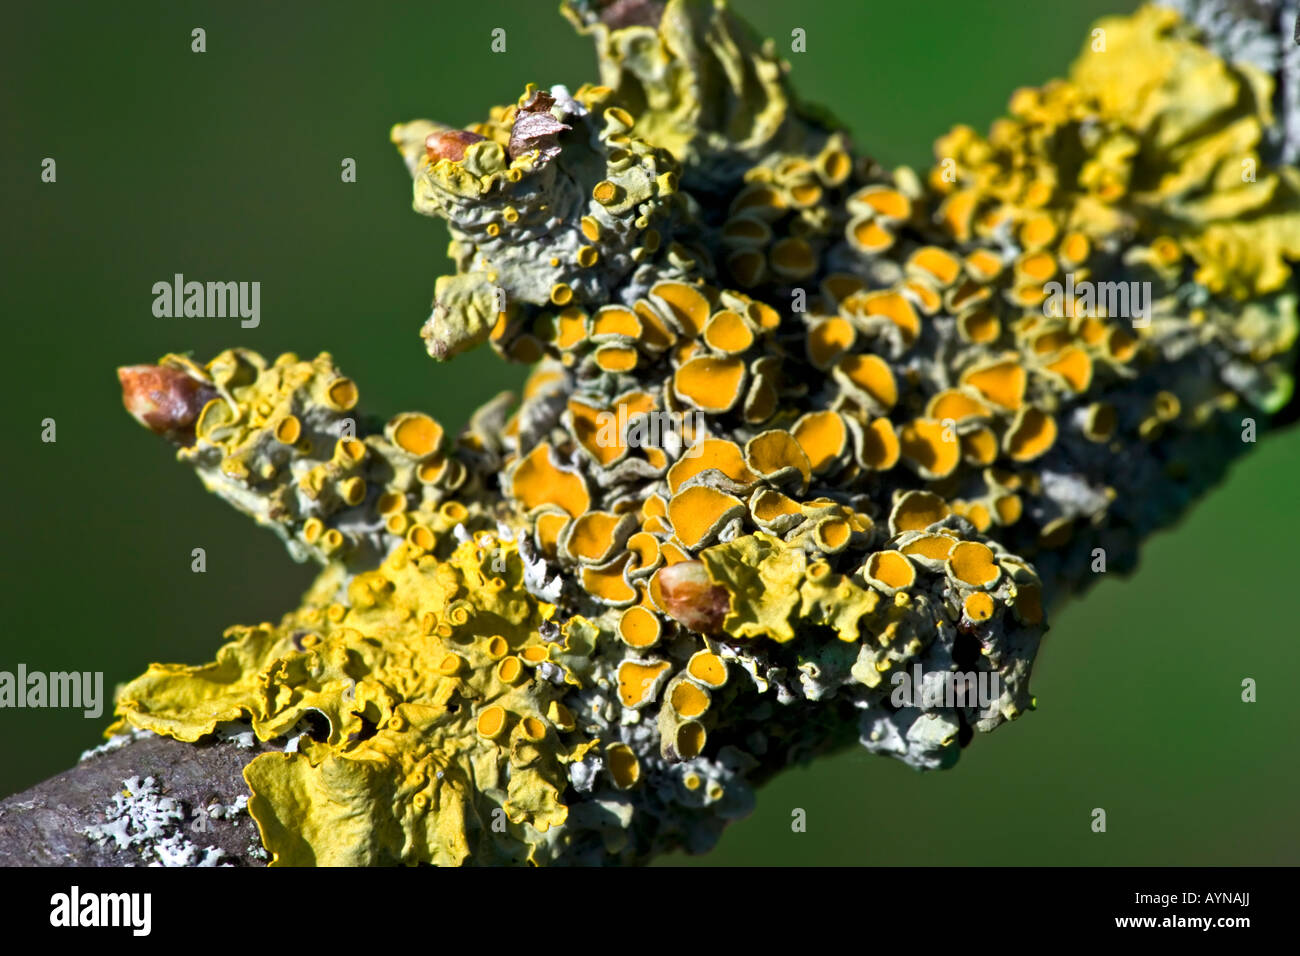 Xanthoria parietina, Common orange lichen on a hawthorn tree - Stock Image